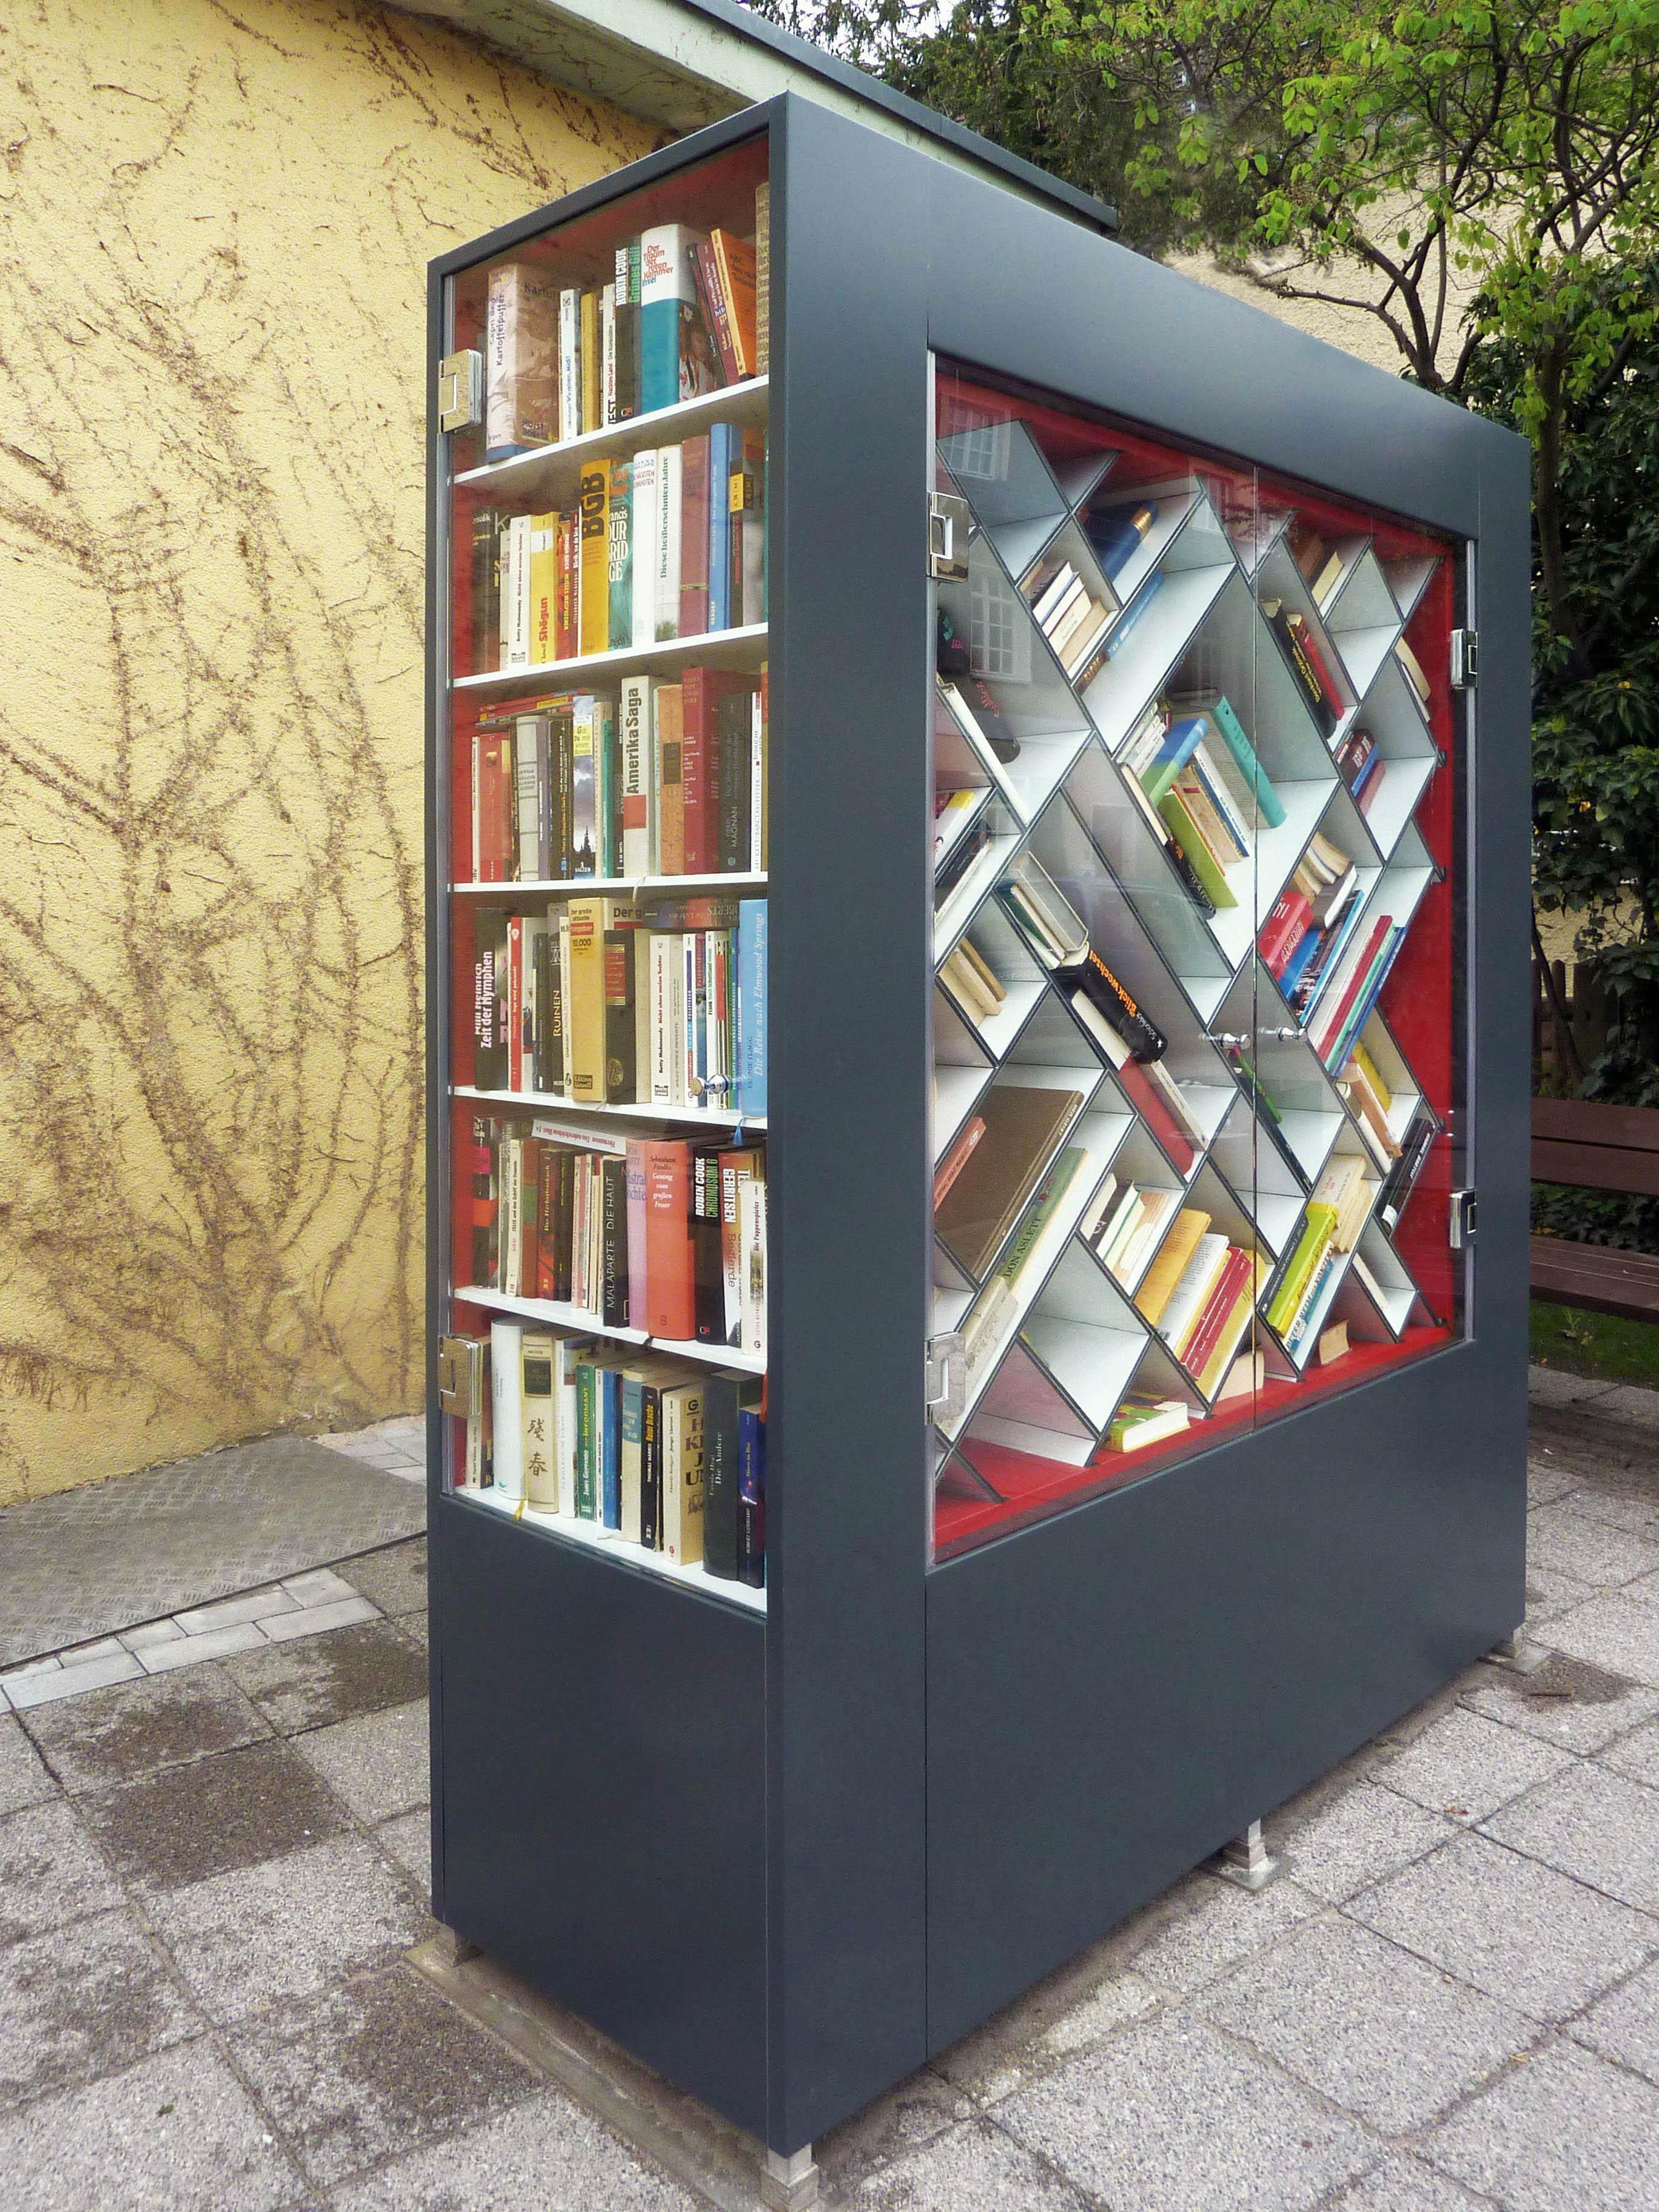 Bücherschrank Rüppurr, Karlsruhe